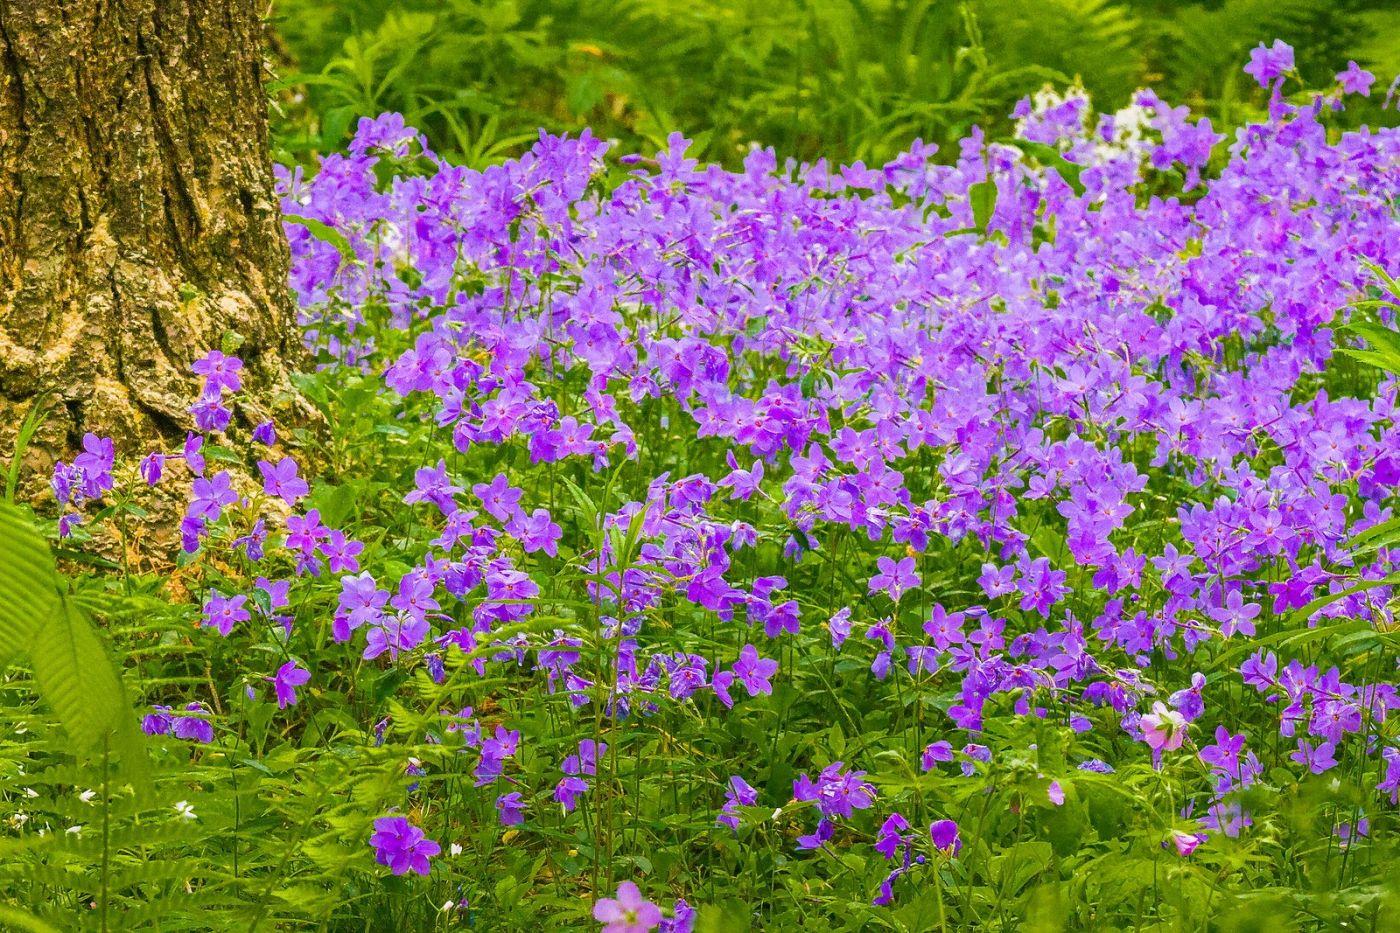 Chanticleer花园,有梦想的季节_图1-21